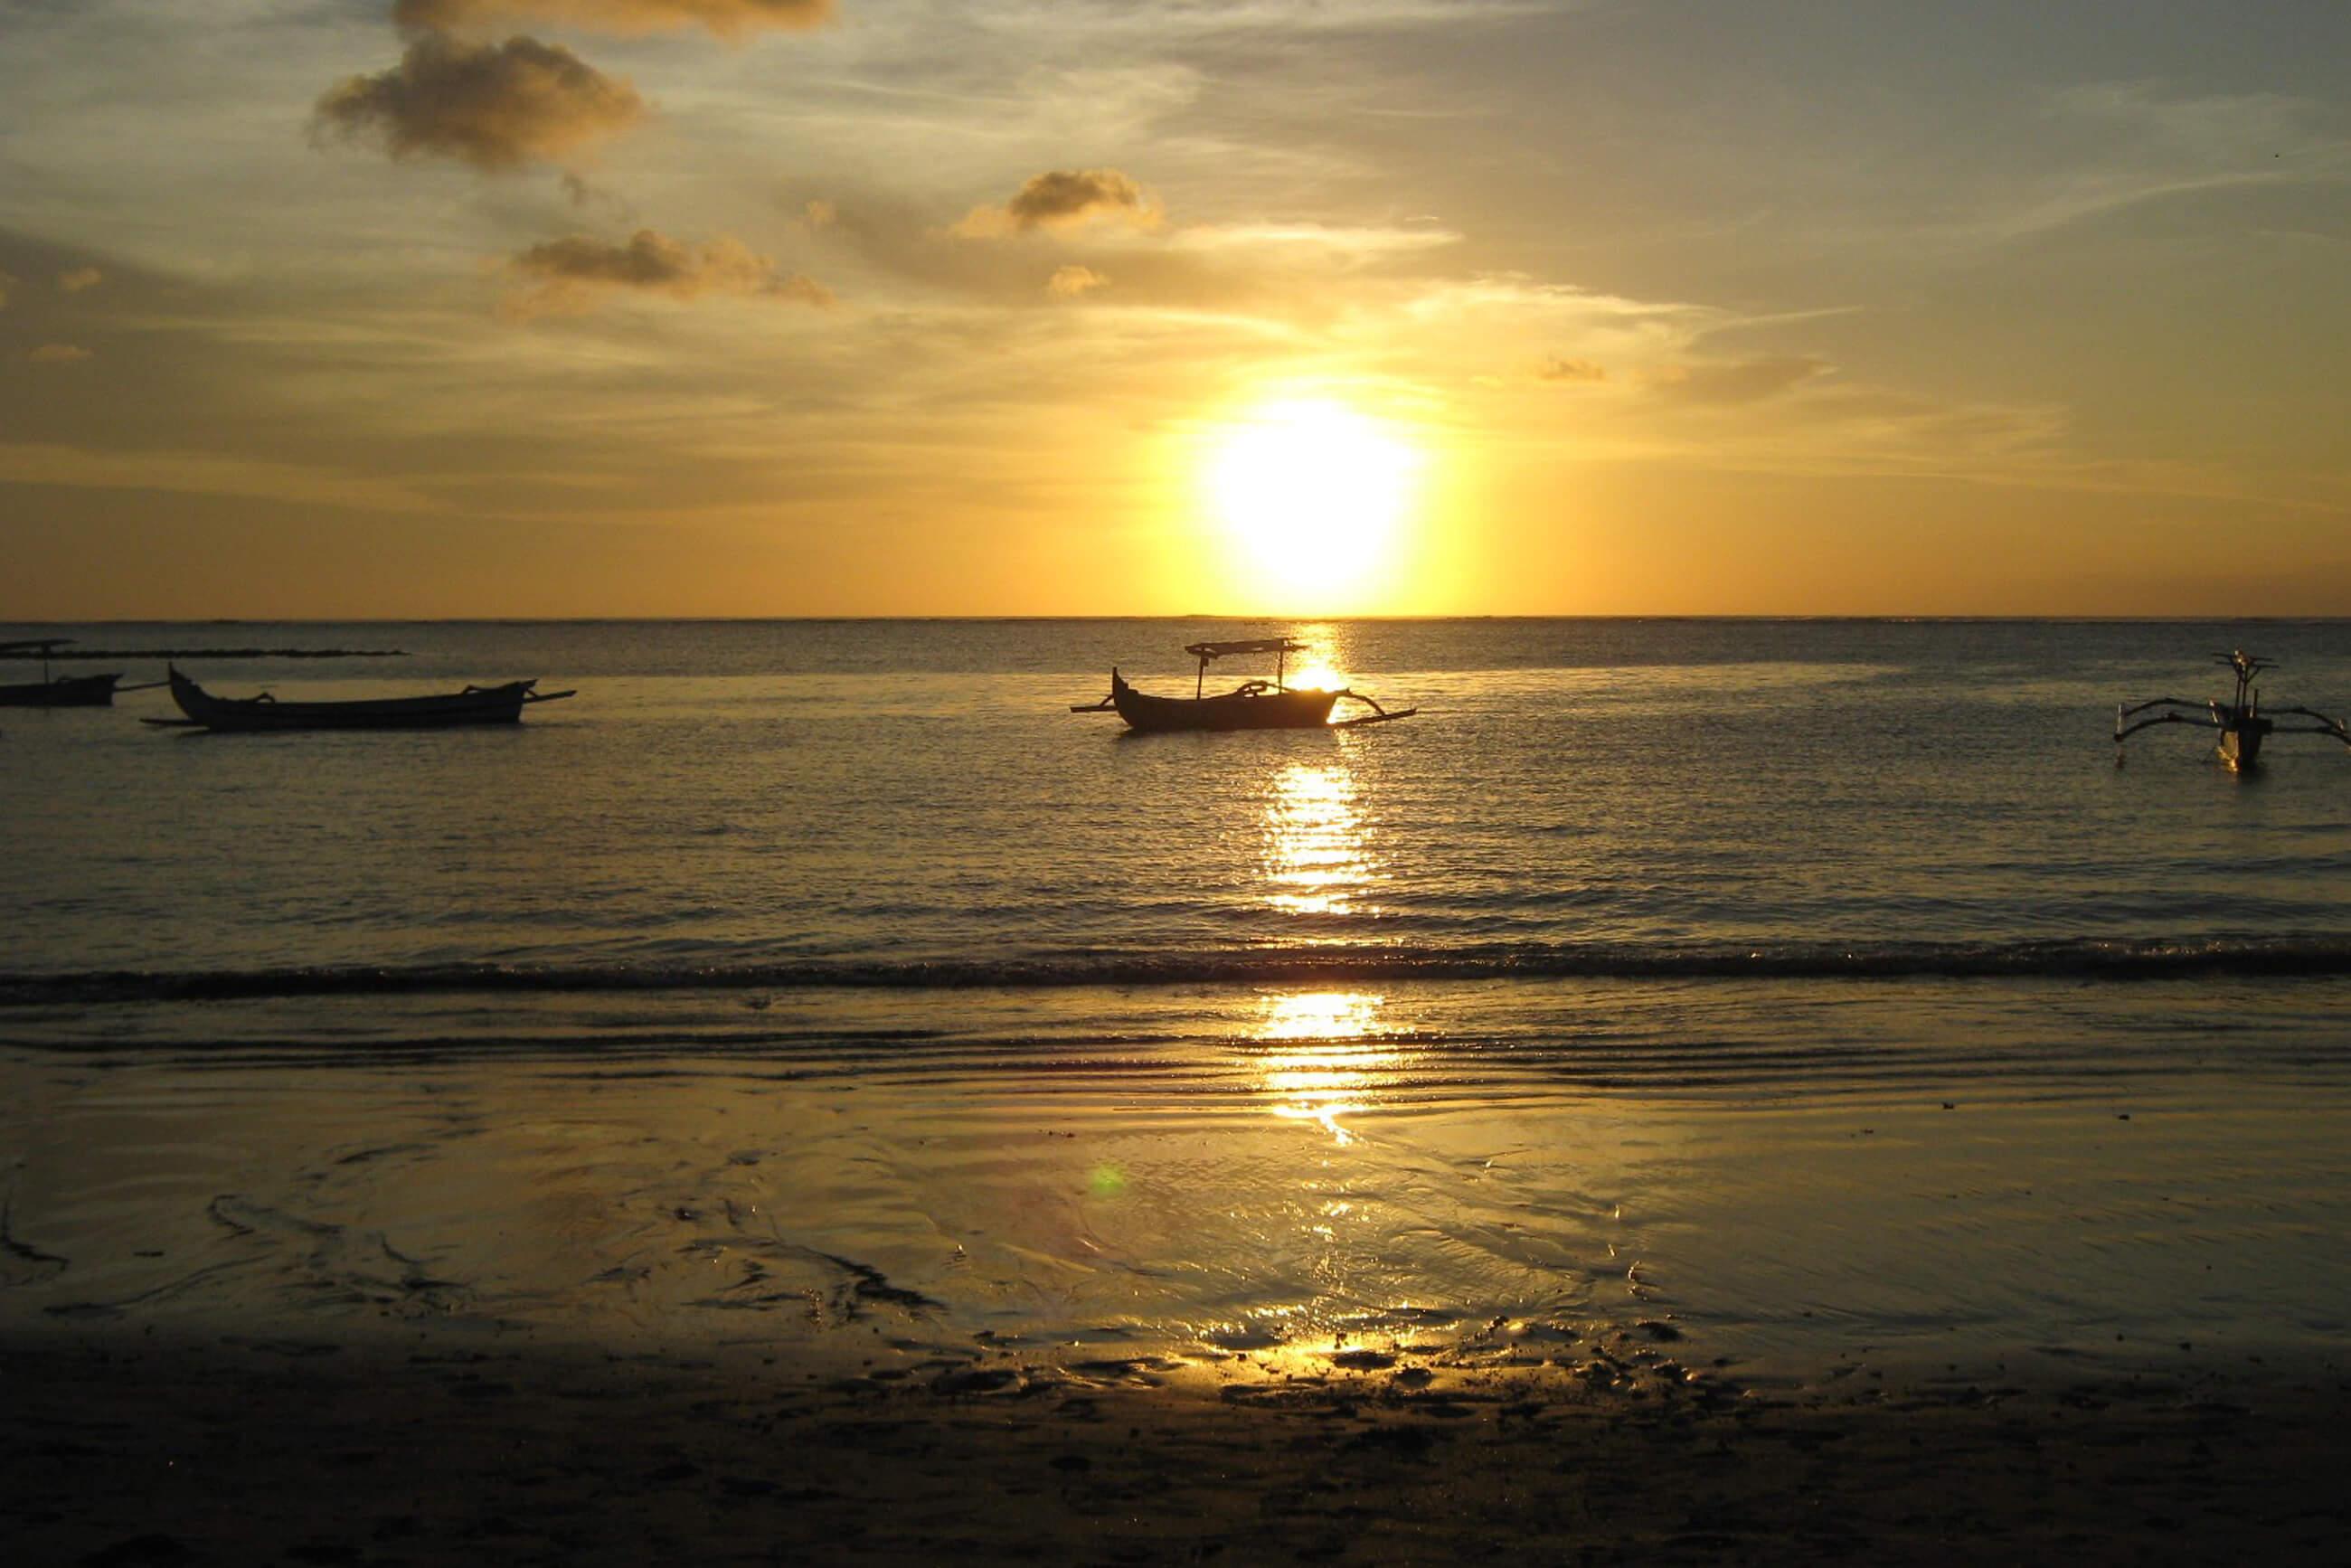 https://bubo.sk/uploads/galleries/4921/pixabay_indonezia_beach-61130-1-.jpg